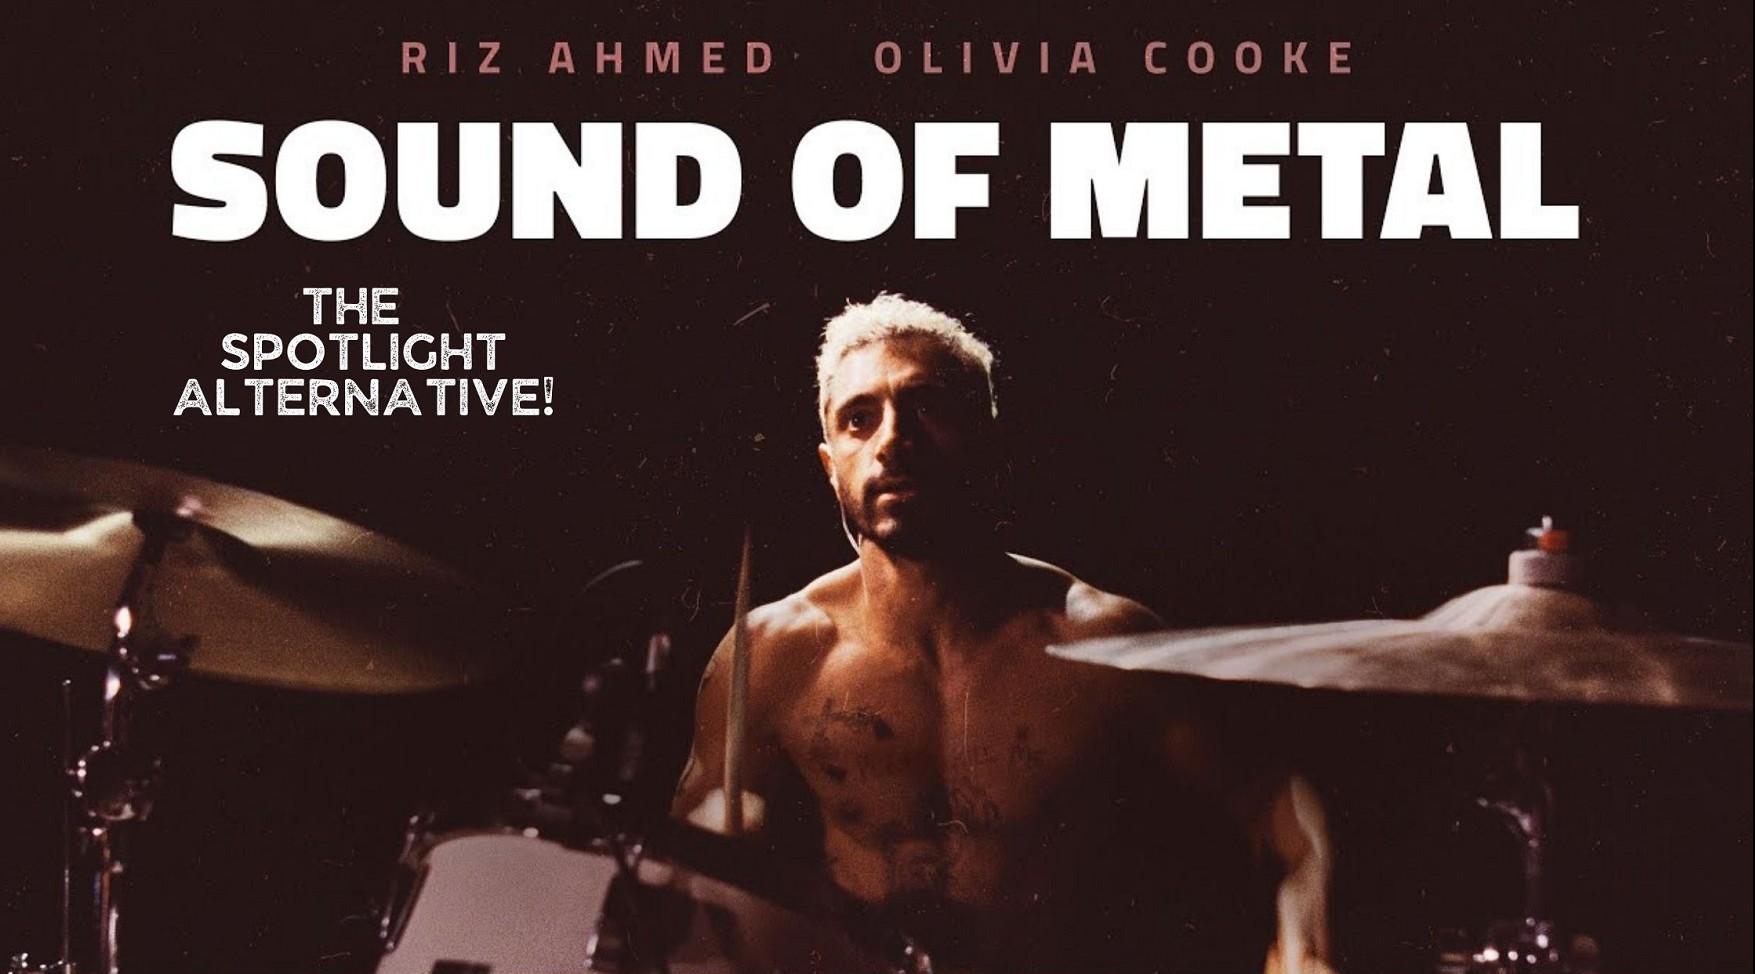 Sound of Metal (The Spotlight Alternative)